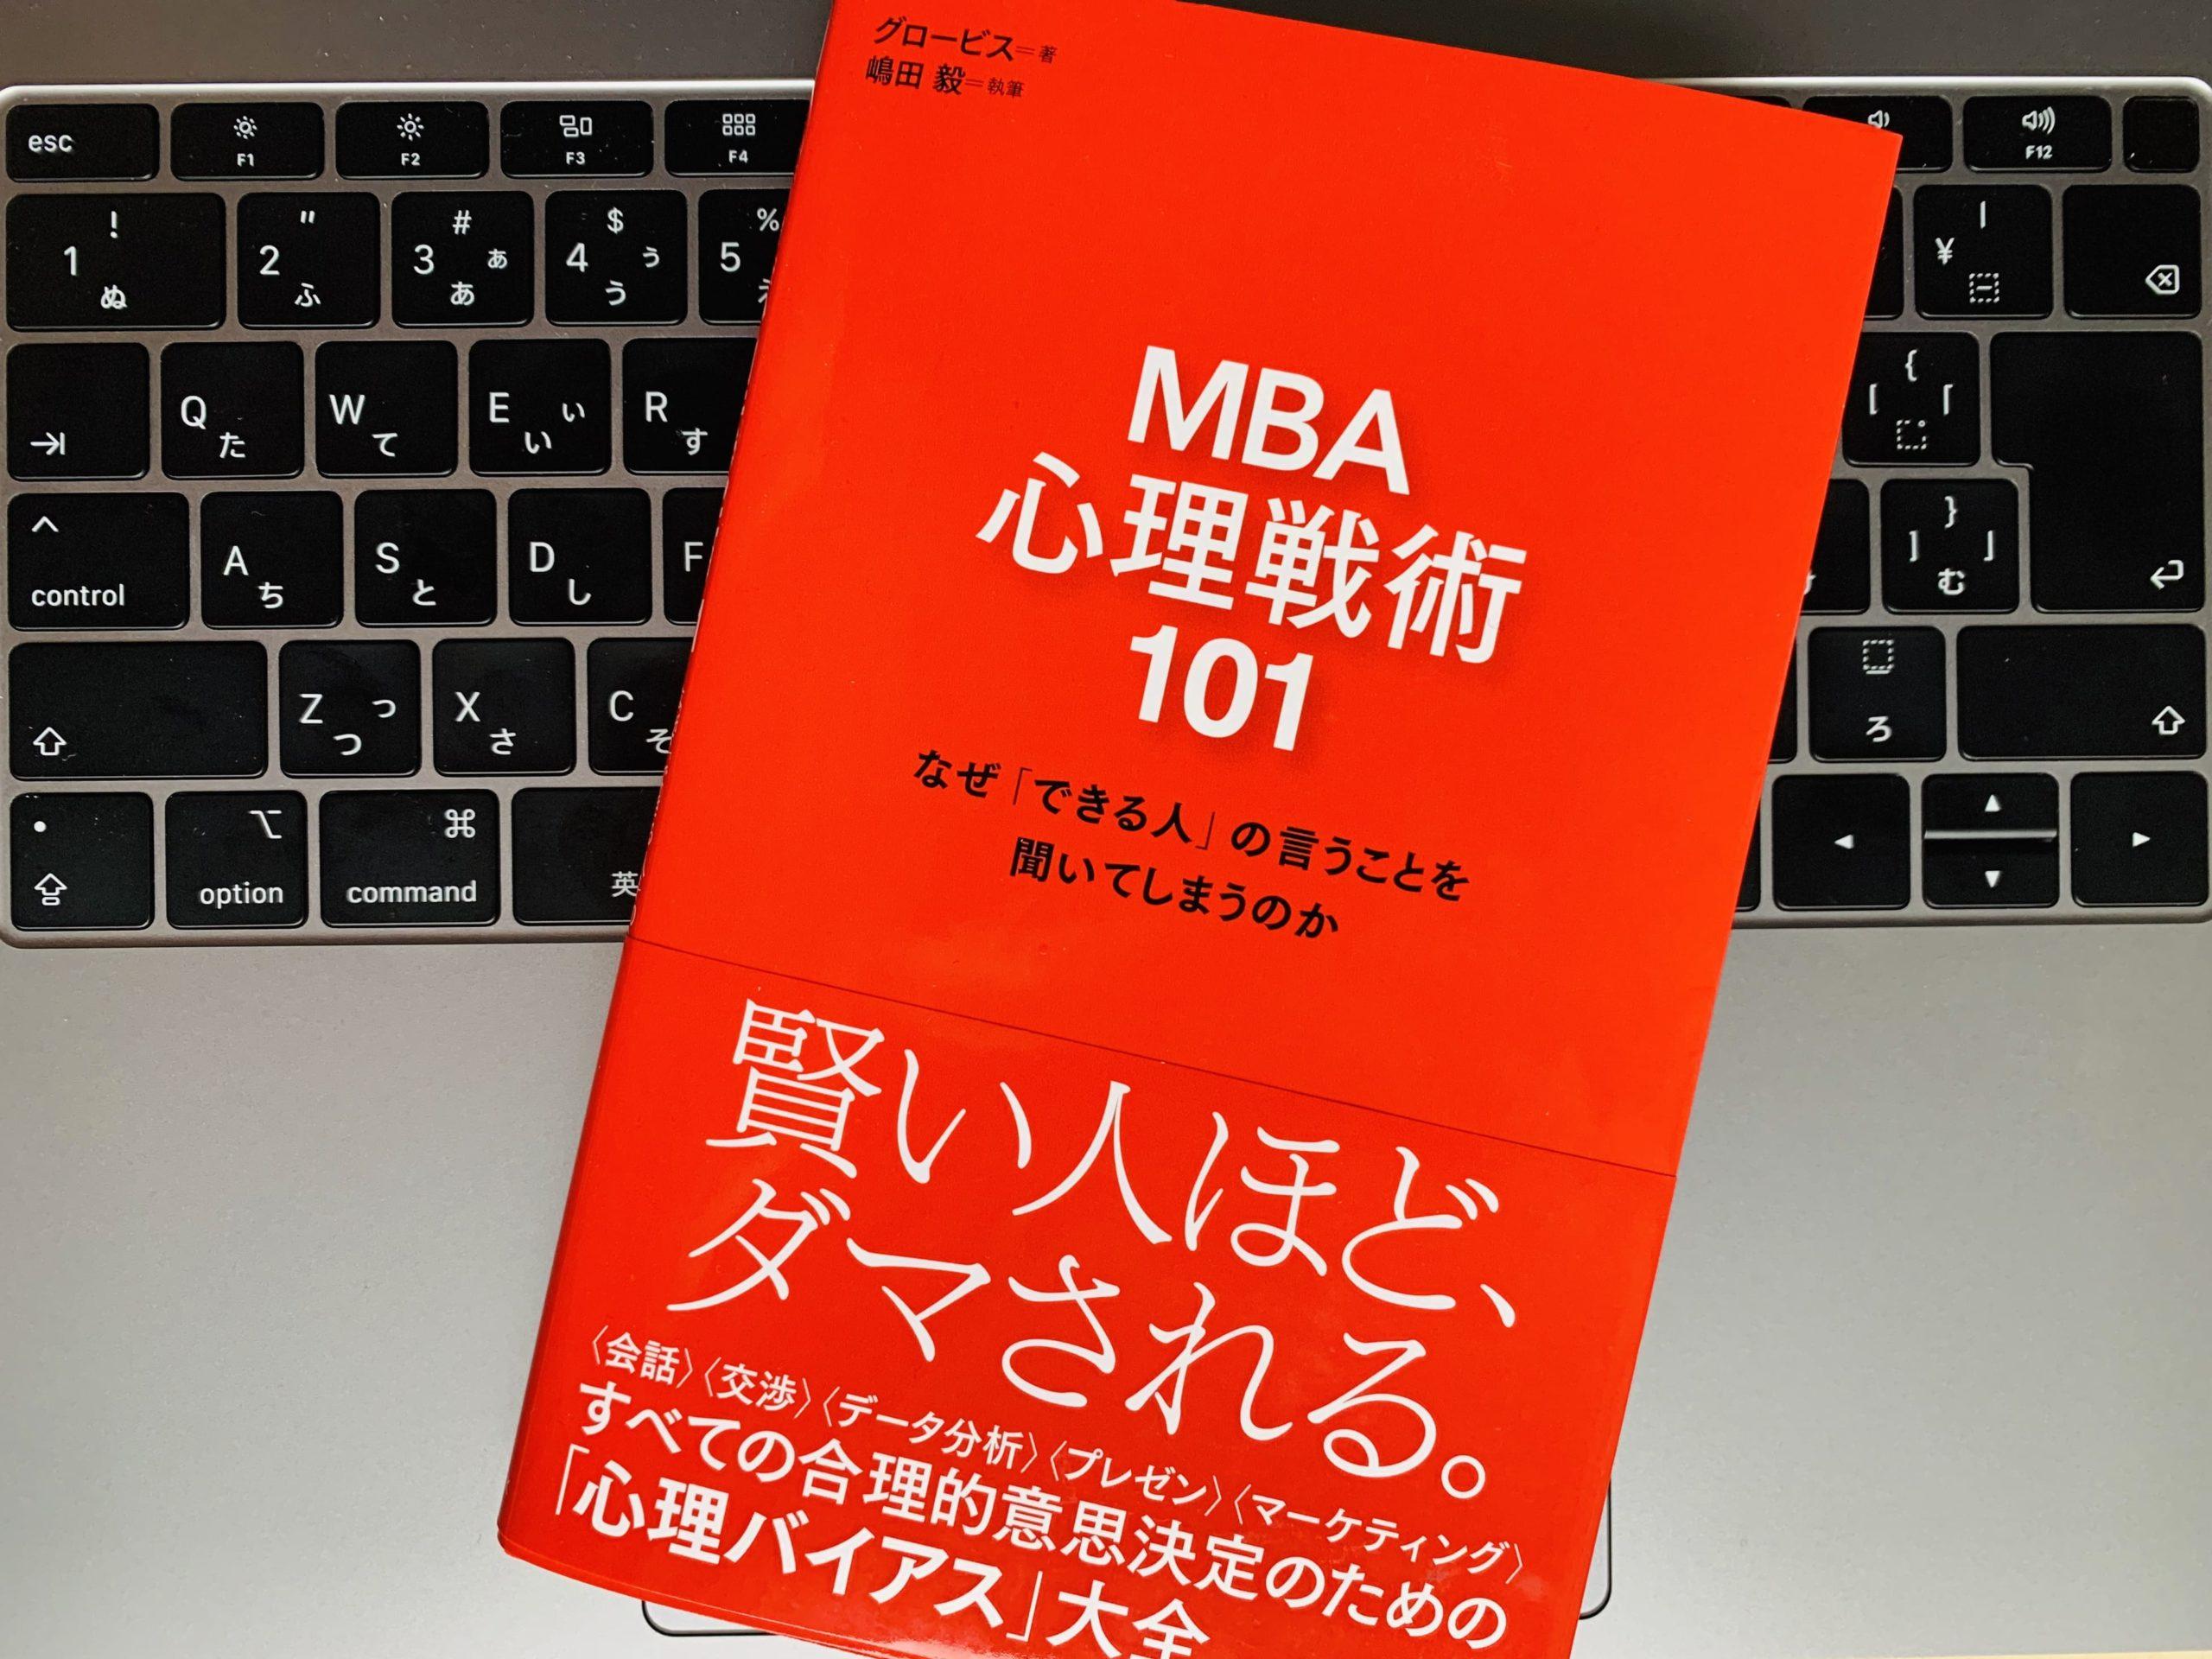 MBA心理戦術101の画像